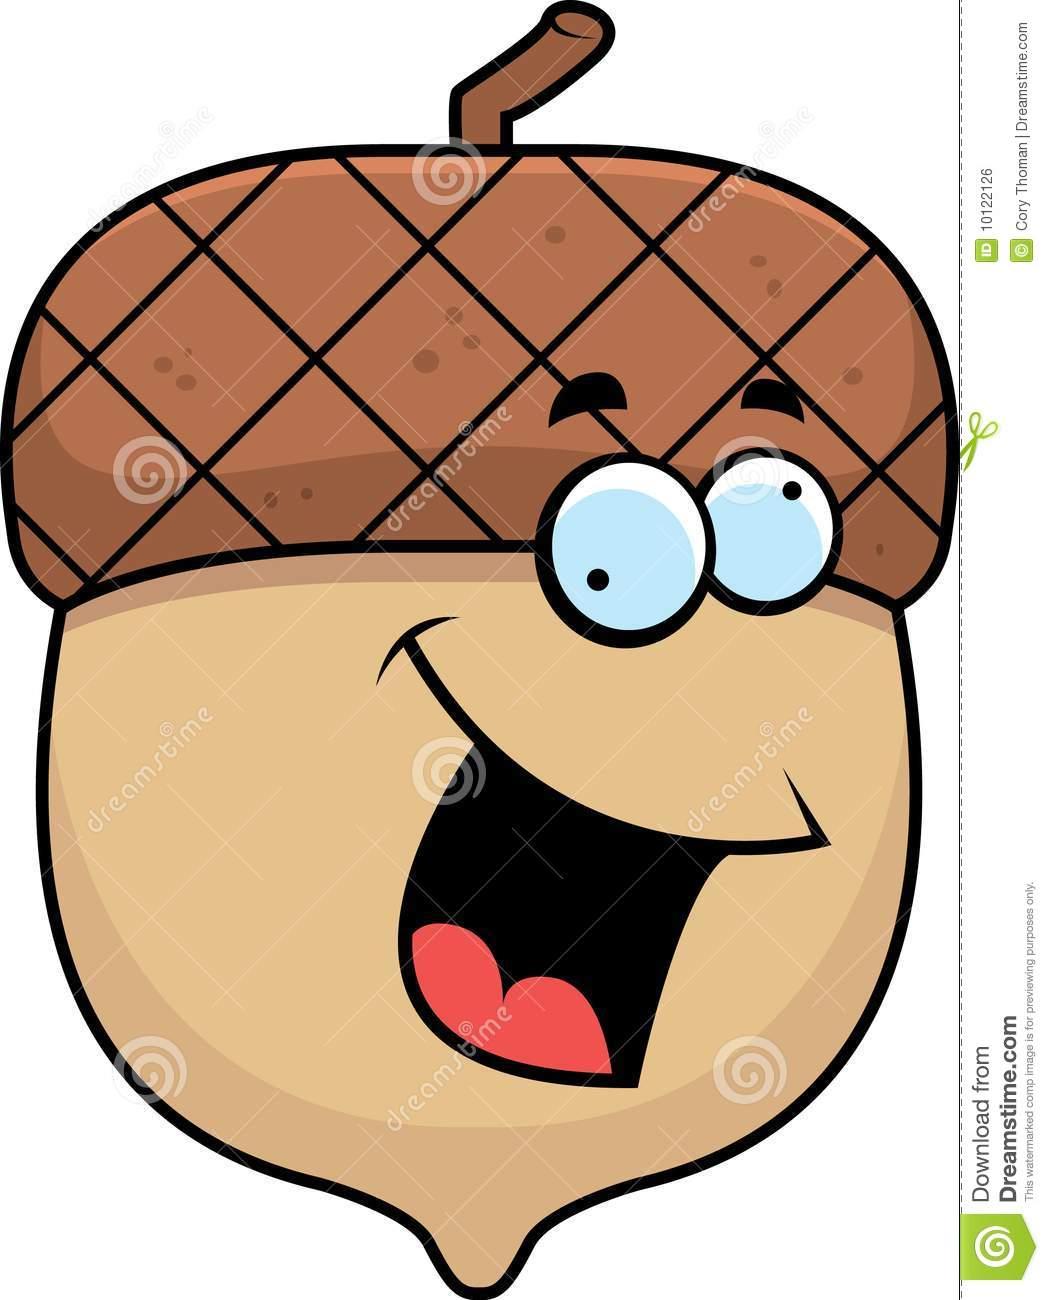 Crazy Nuts Clipart - Clipart Kid